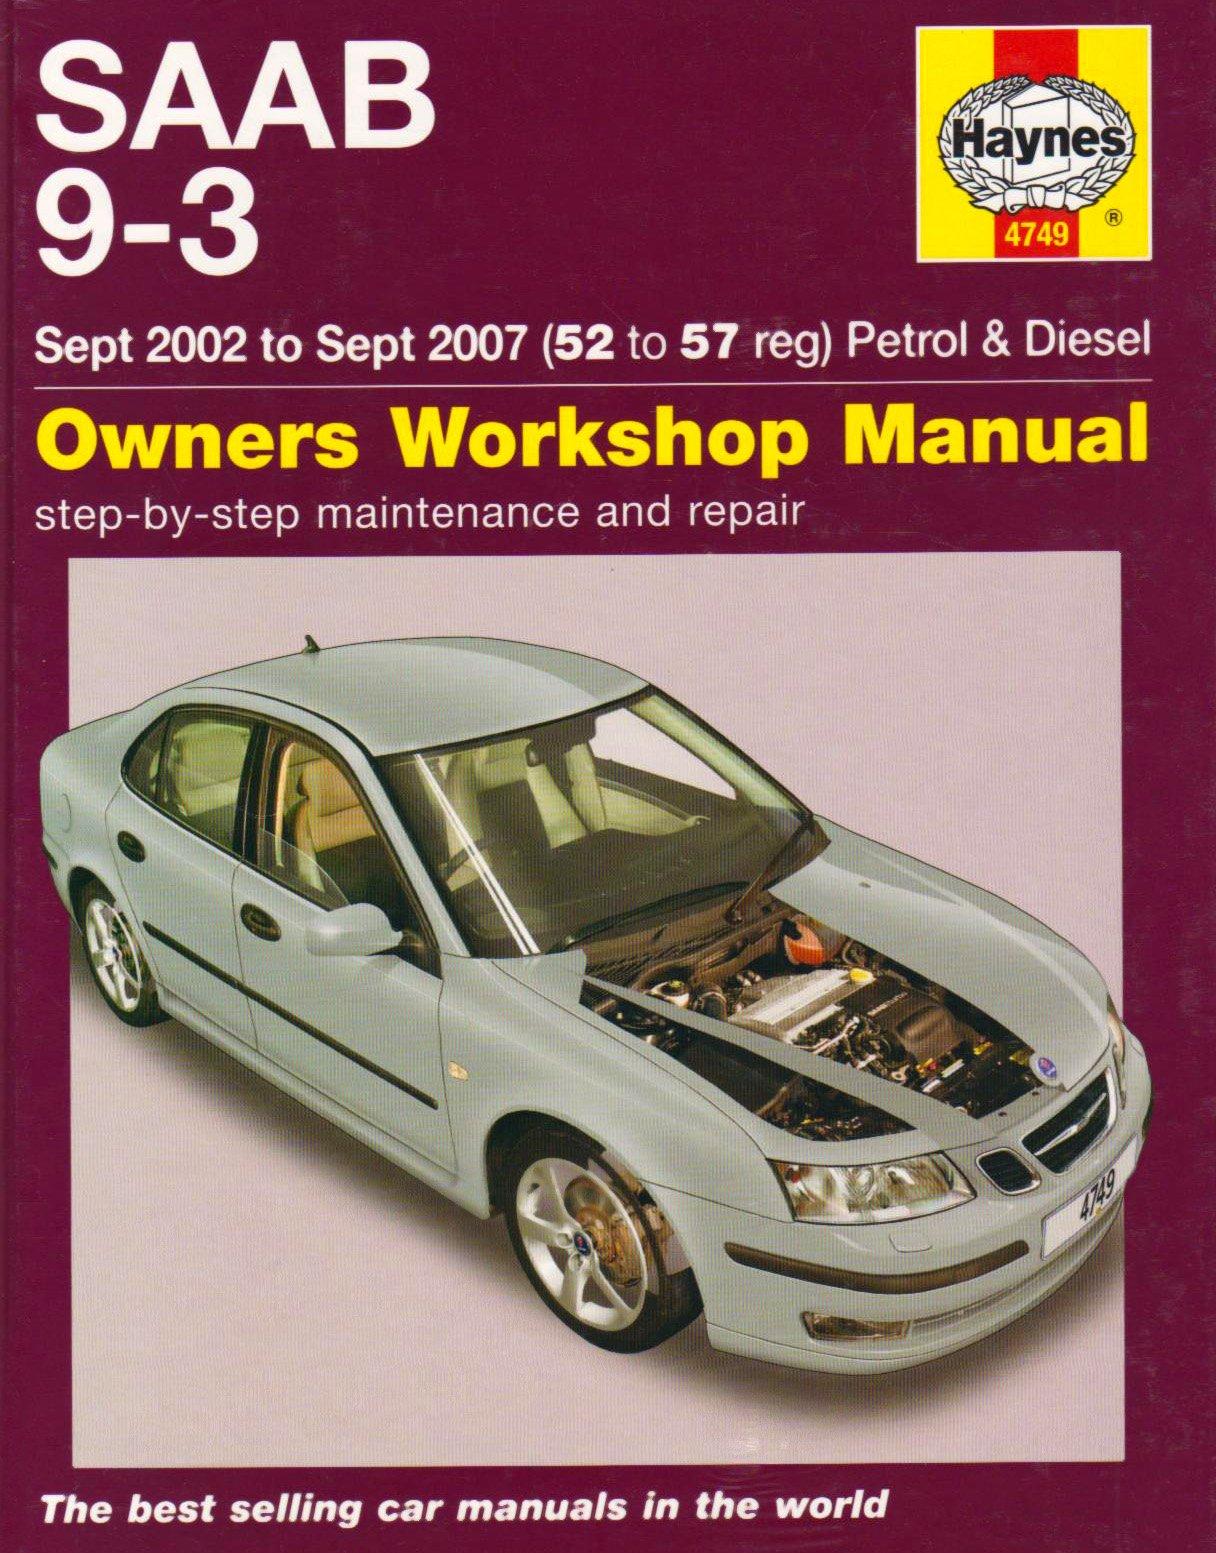 Saab 9-3 (02 - 06) (Service & repair manuals): Amazon.co.uk: A K Legg:  9781844257492: Books